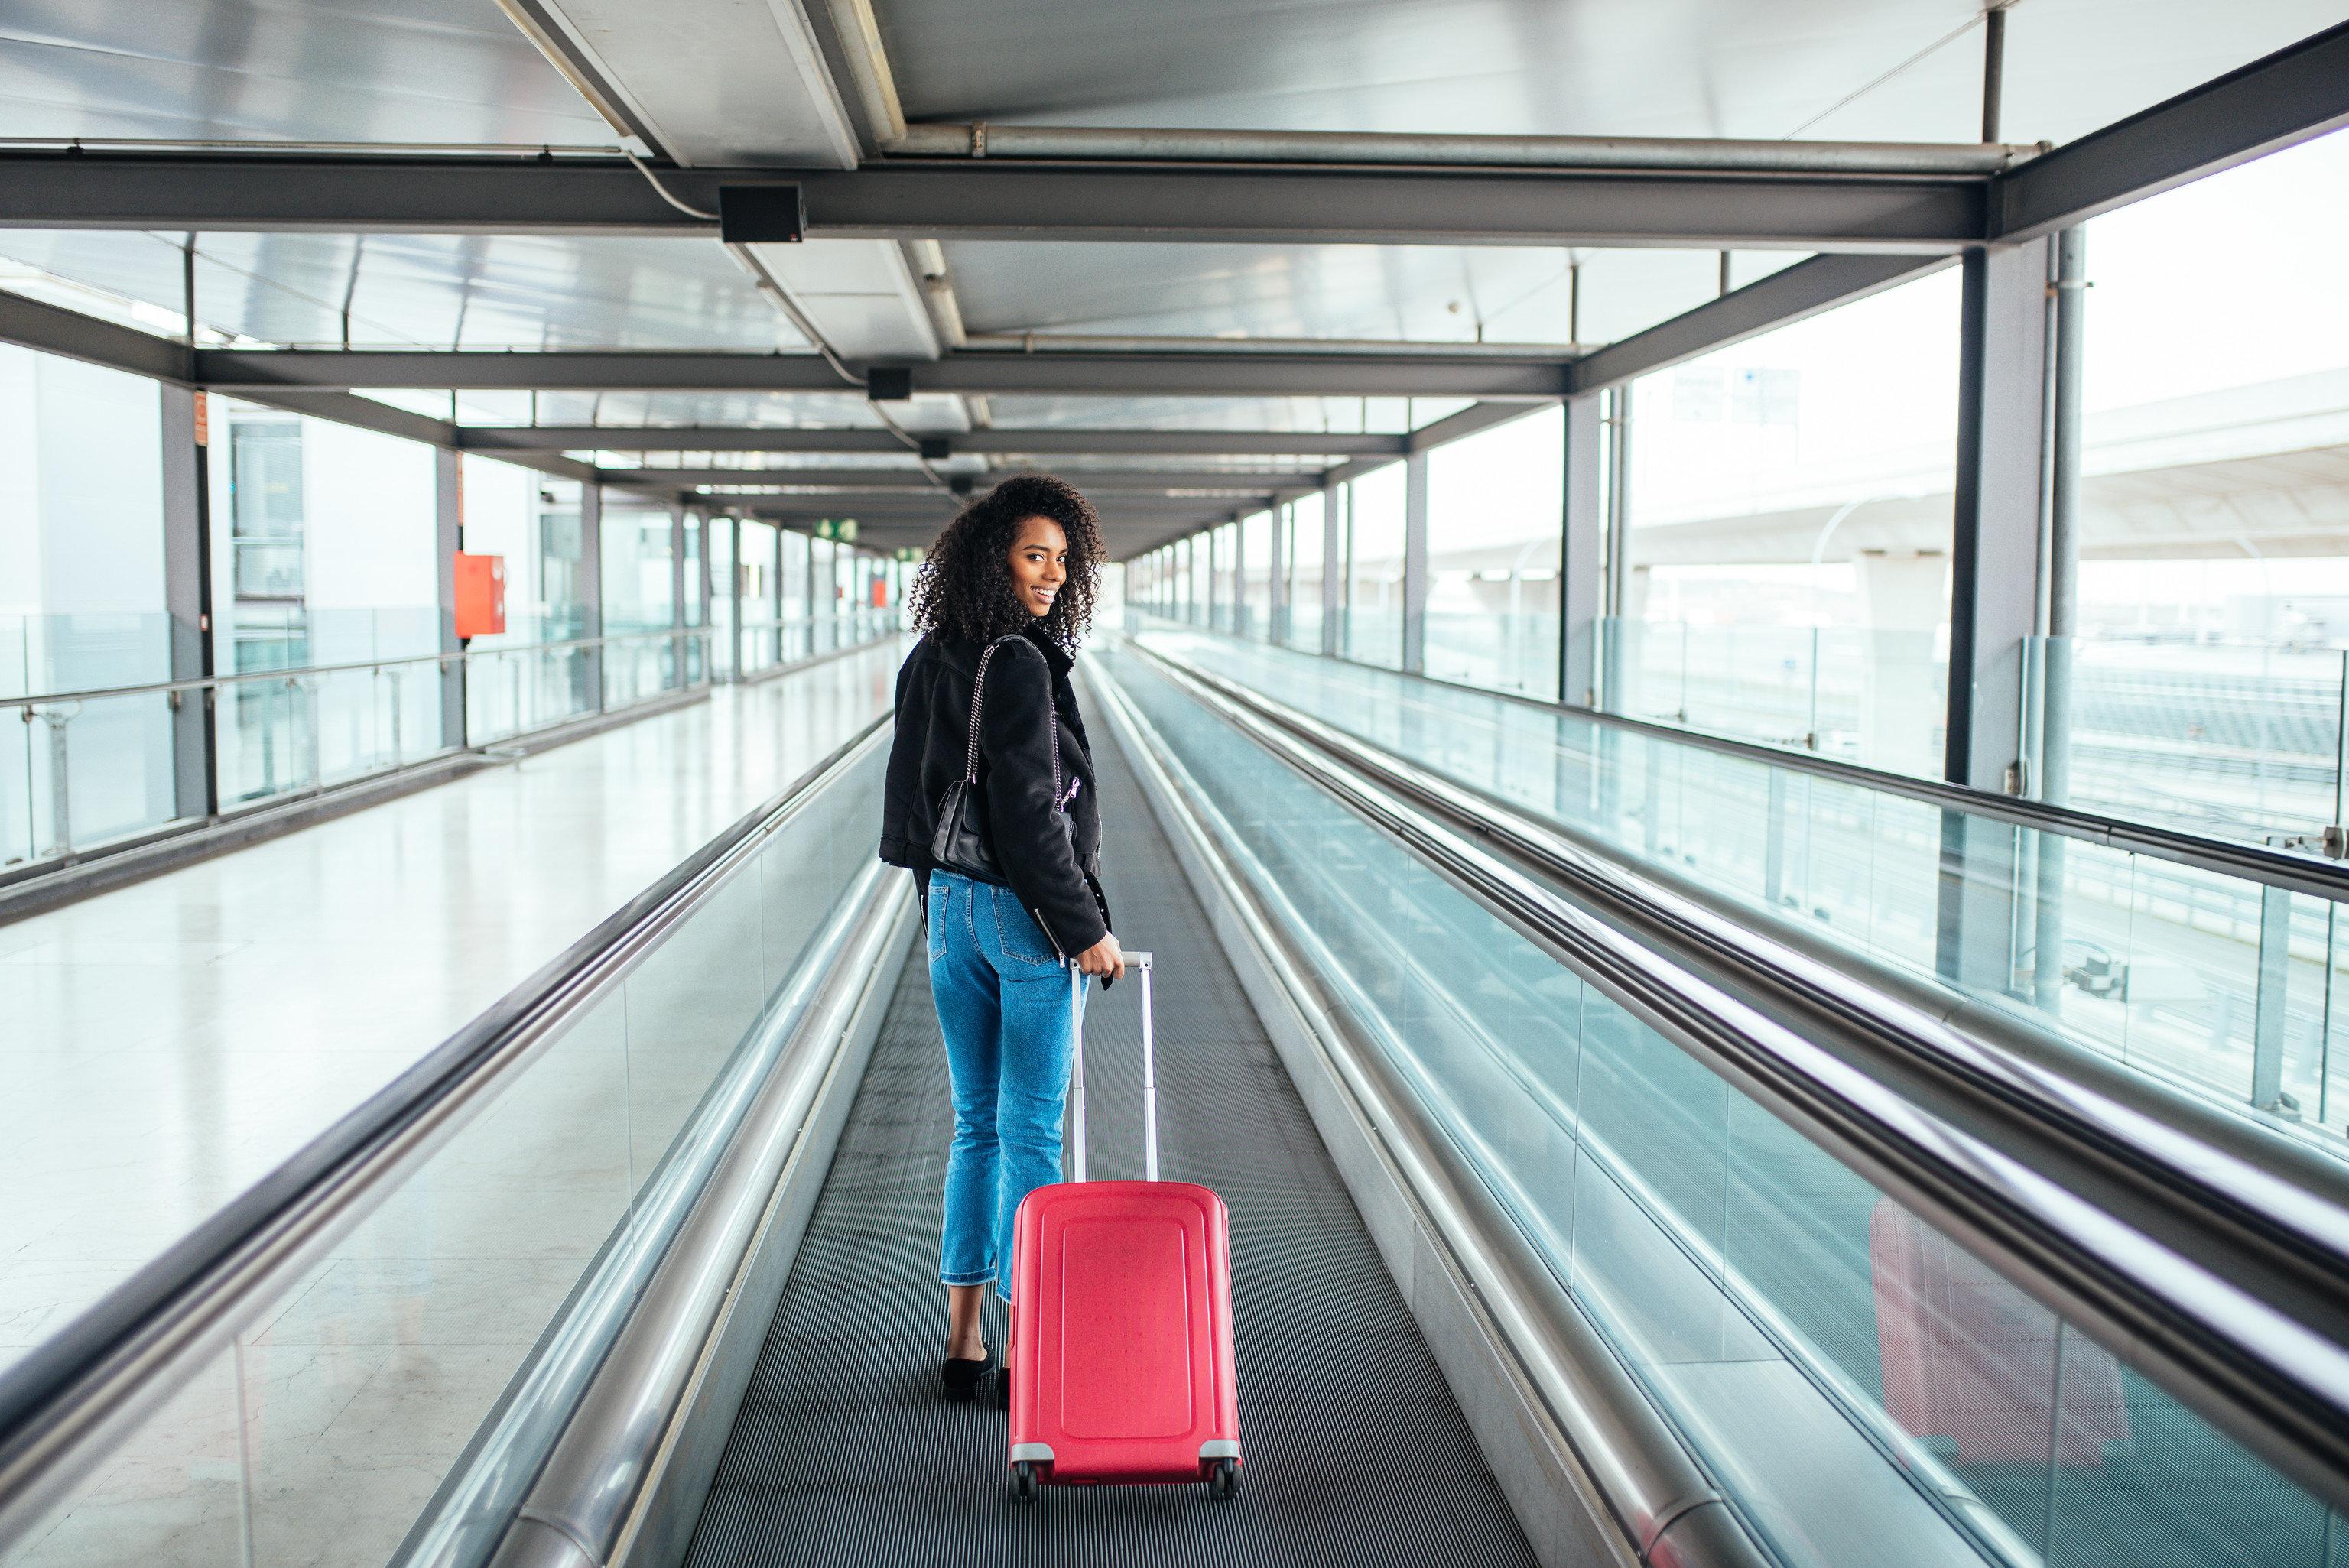 Travel Shop escalator indoor luggage ceiling platform infrastructure airport train public transport building subway pulling